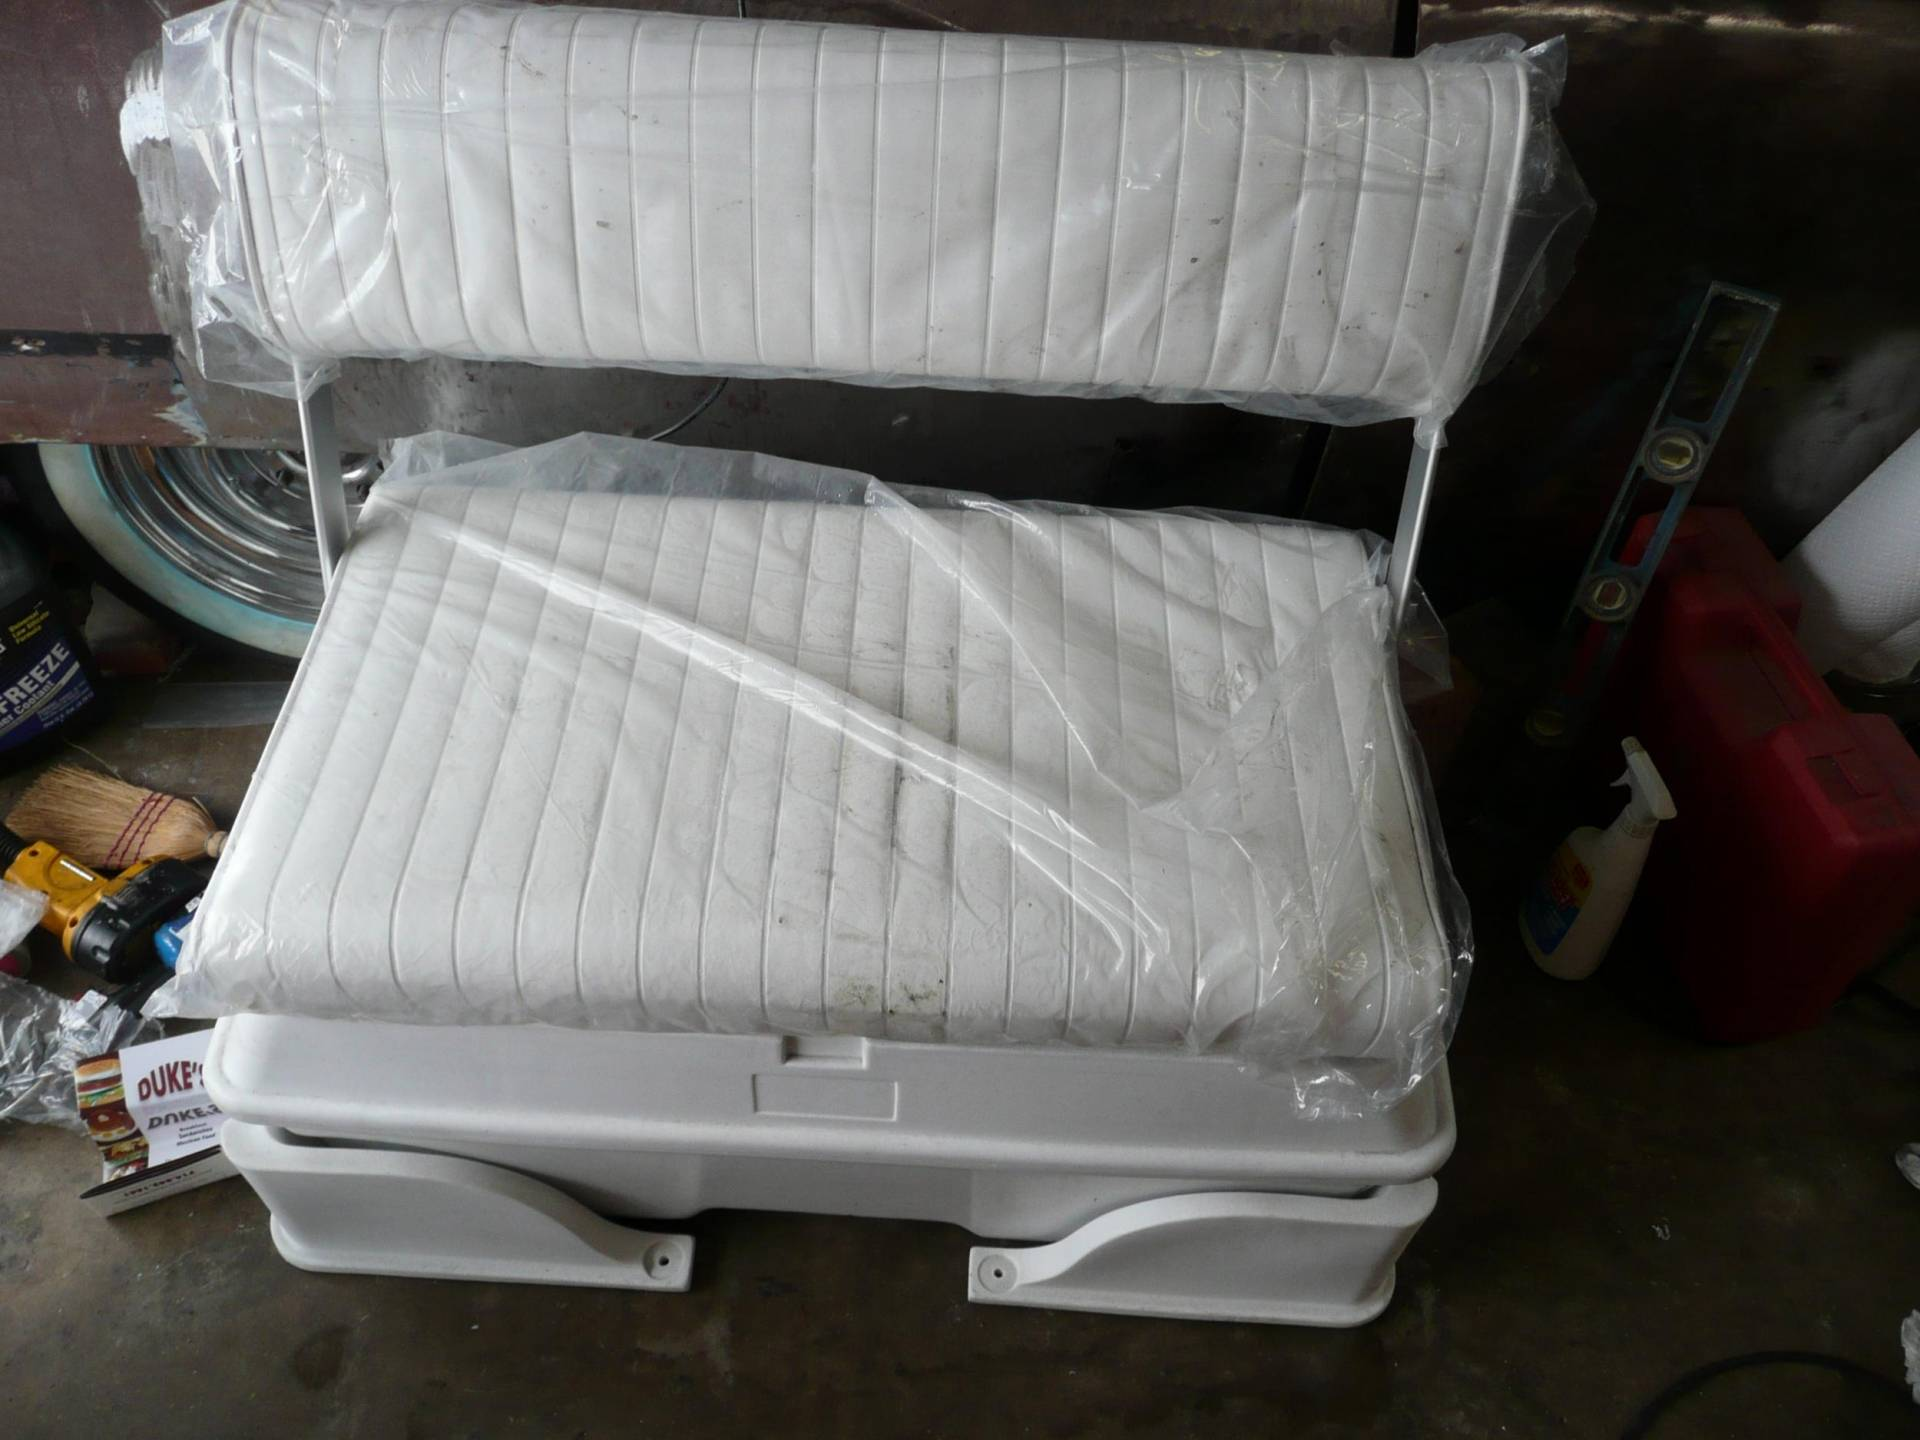 Moeller Deluxe Swing Back Cooler Livewell Seat Bloodydecks